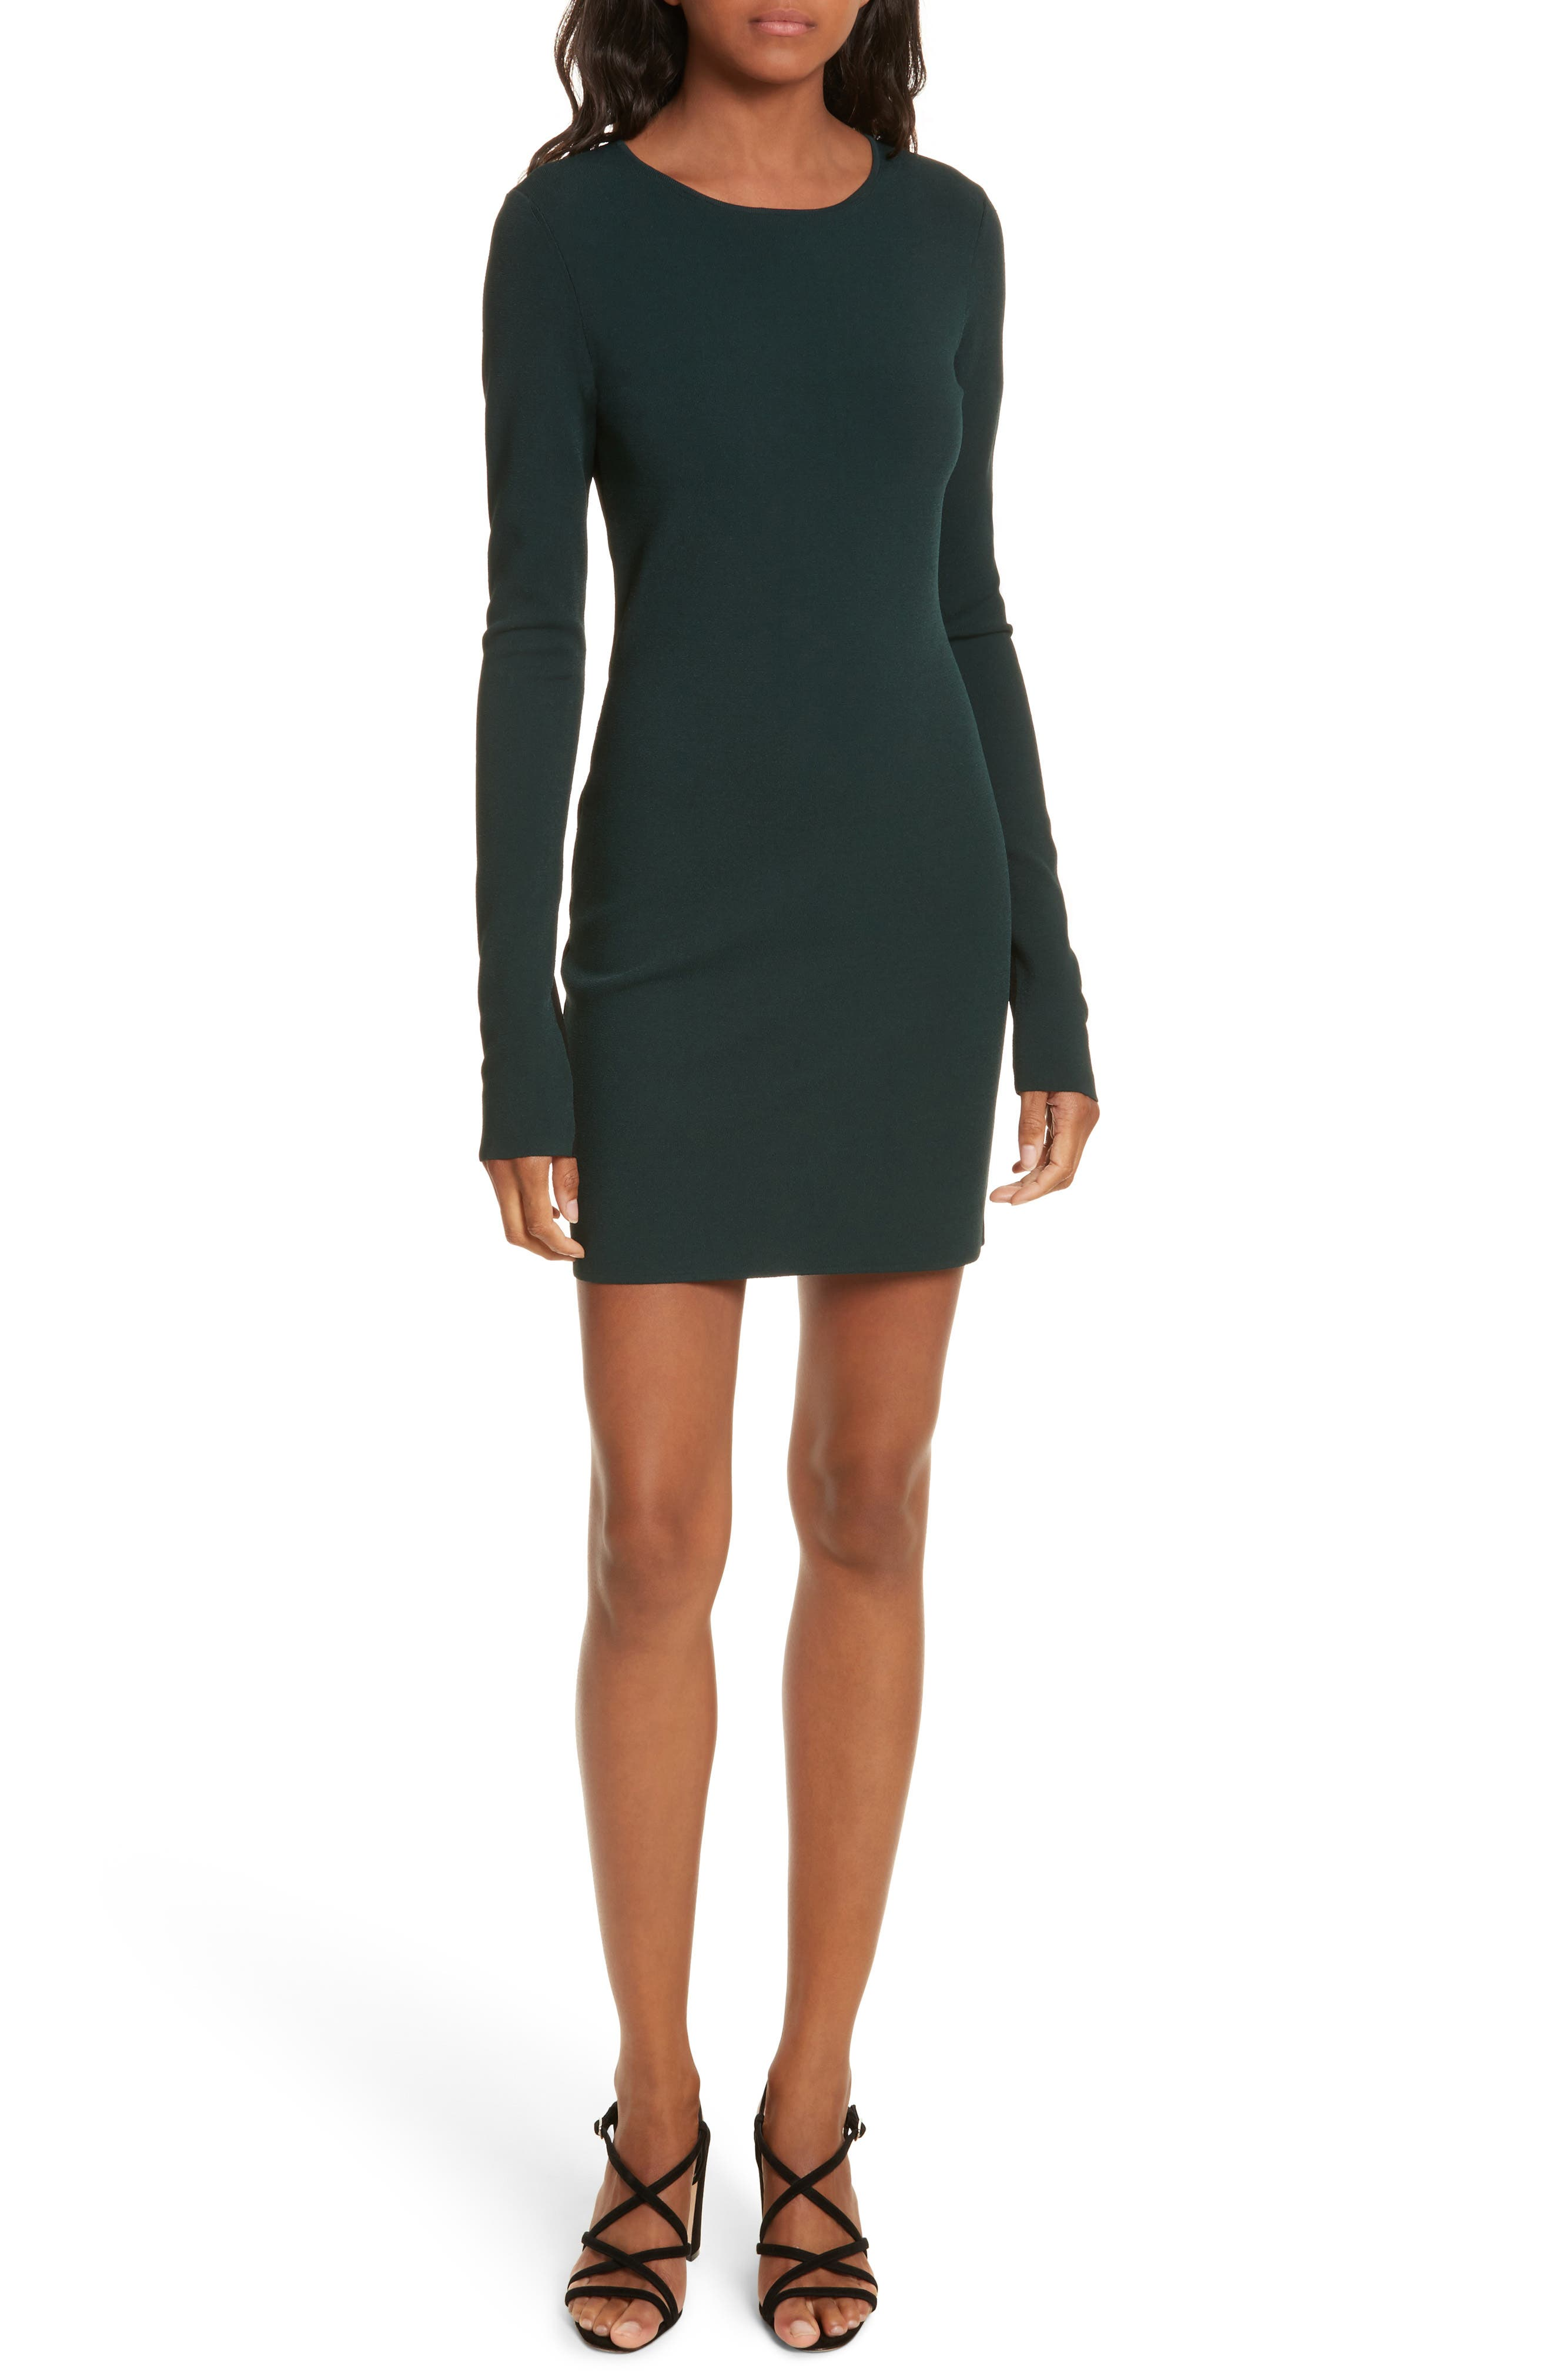 Diane von Furstenberg Long Sleeve Minidress,                             Main thumbnail 1, color,                             361